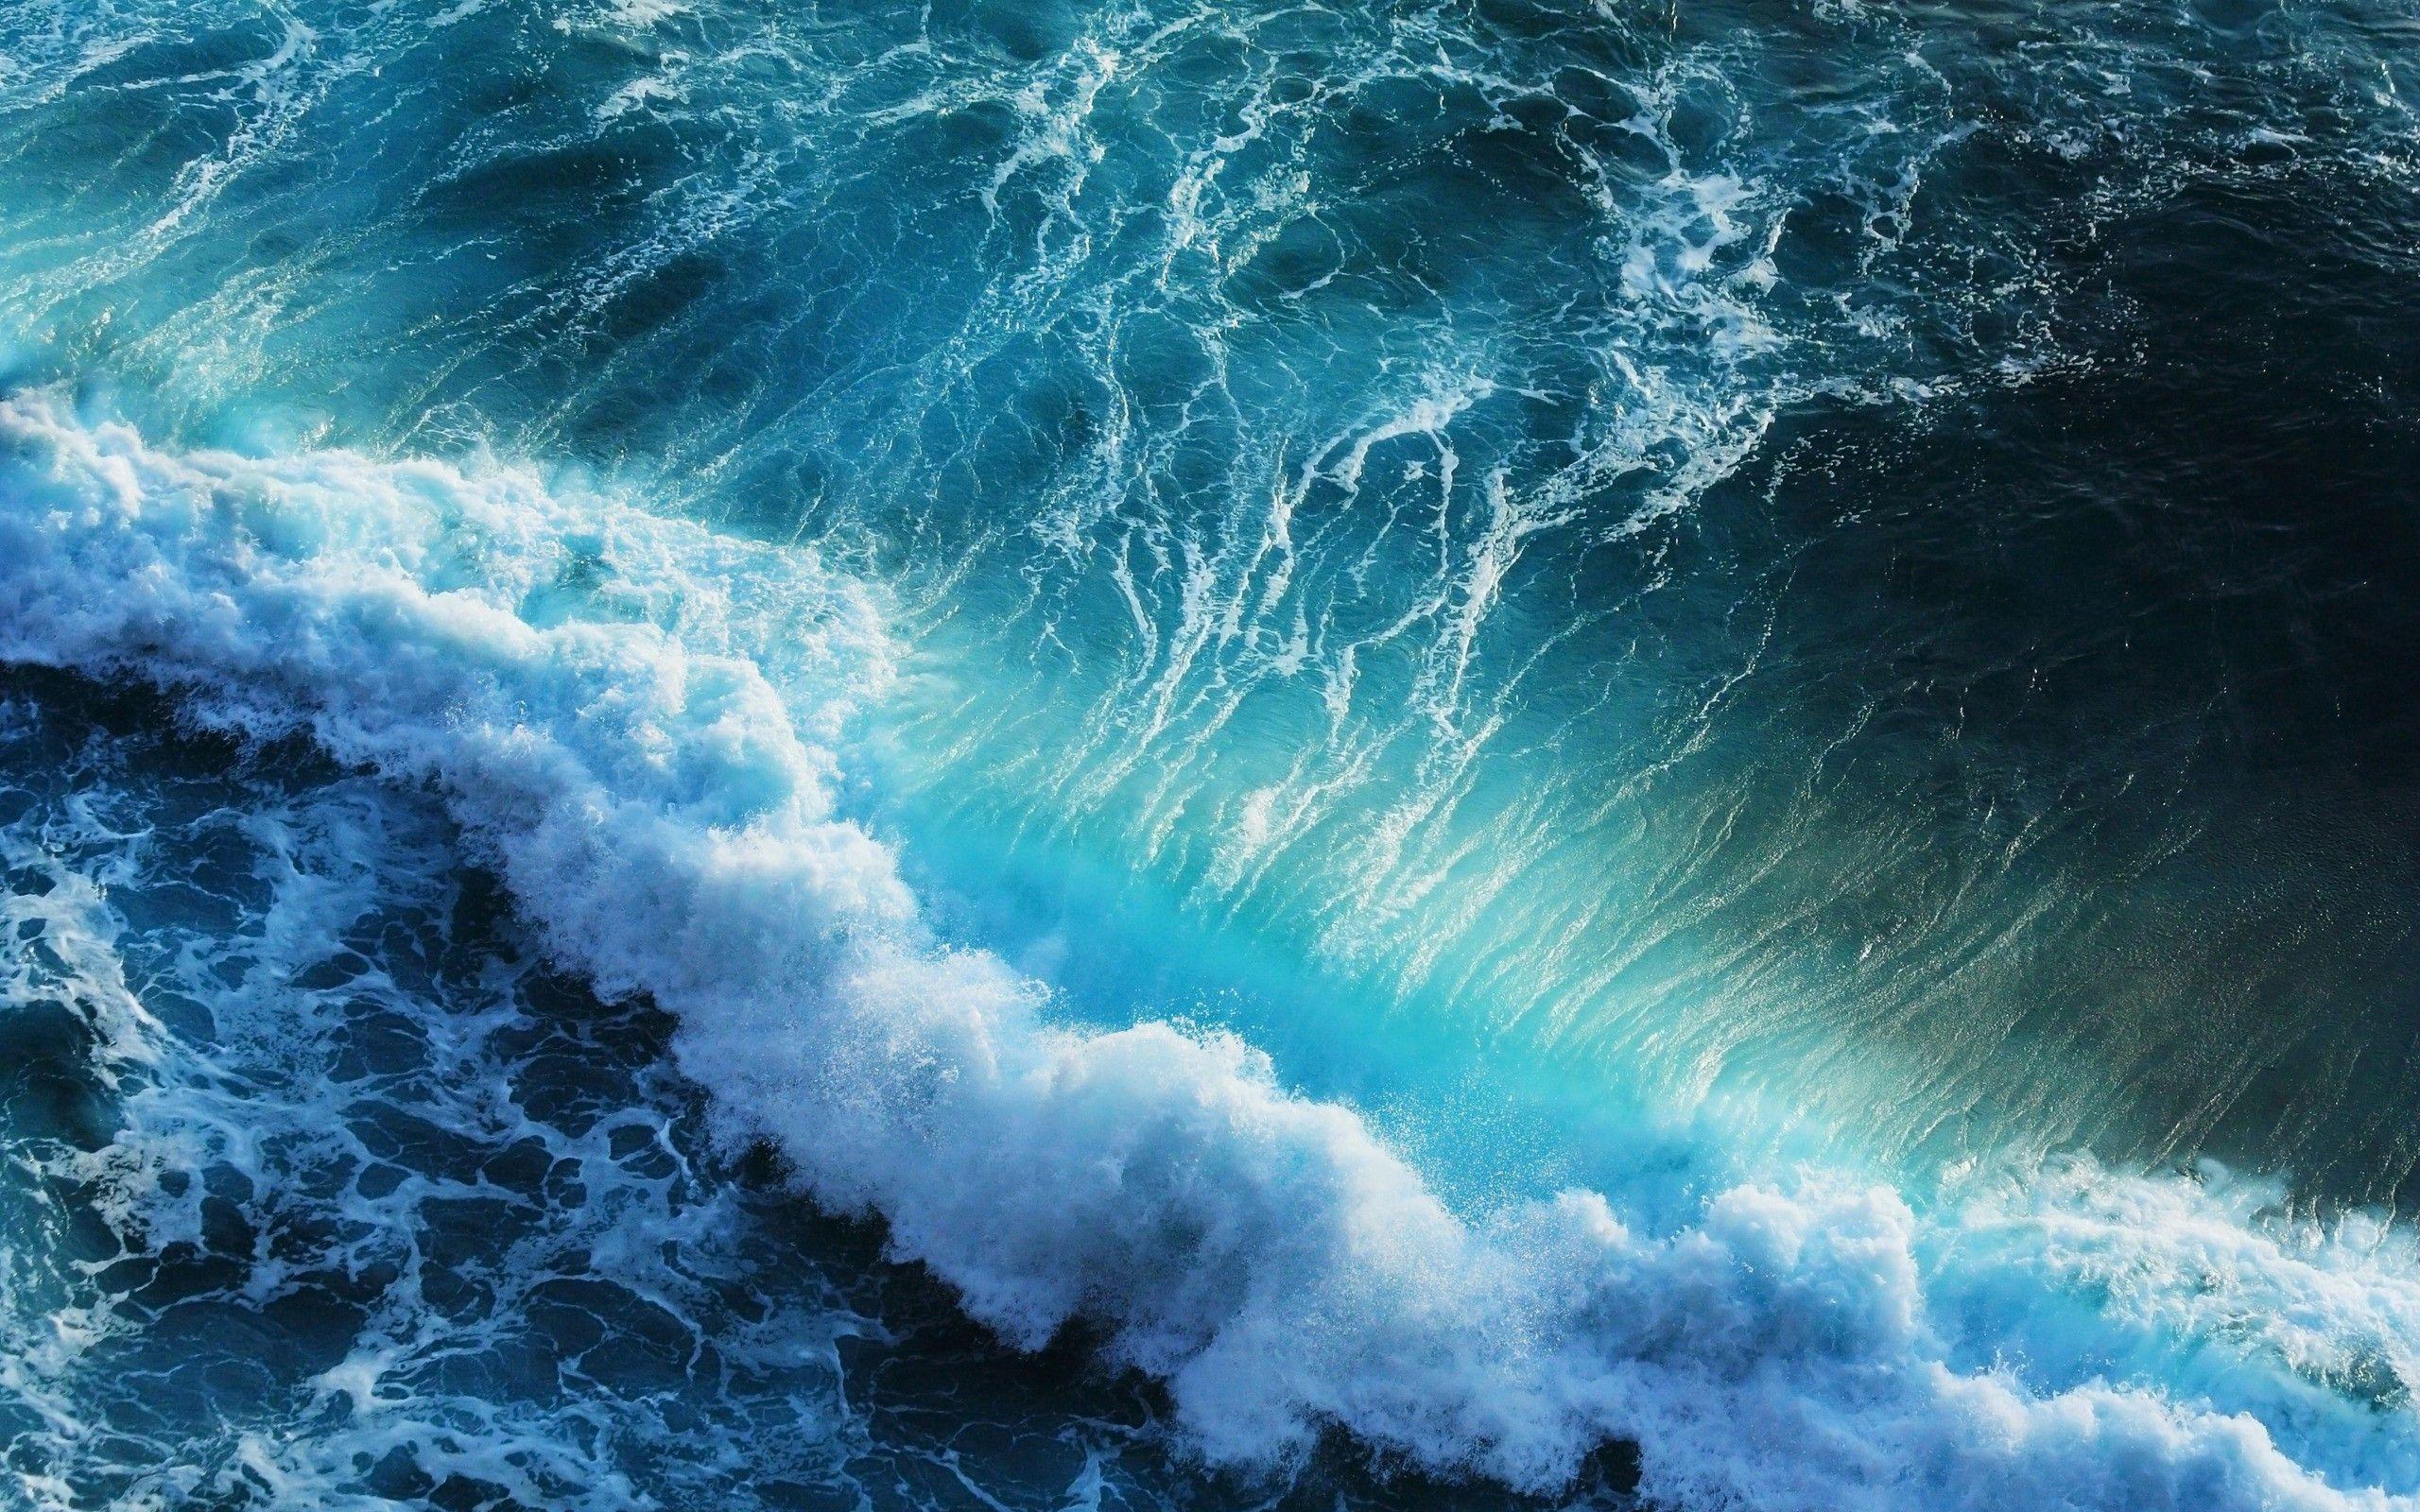 4K Ultra HD Ocean Wallpapers - Top Free 4K Ultra HD Ocean ...